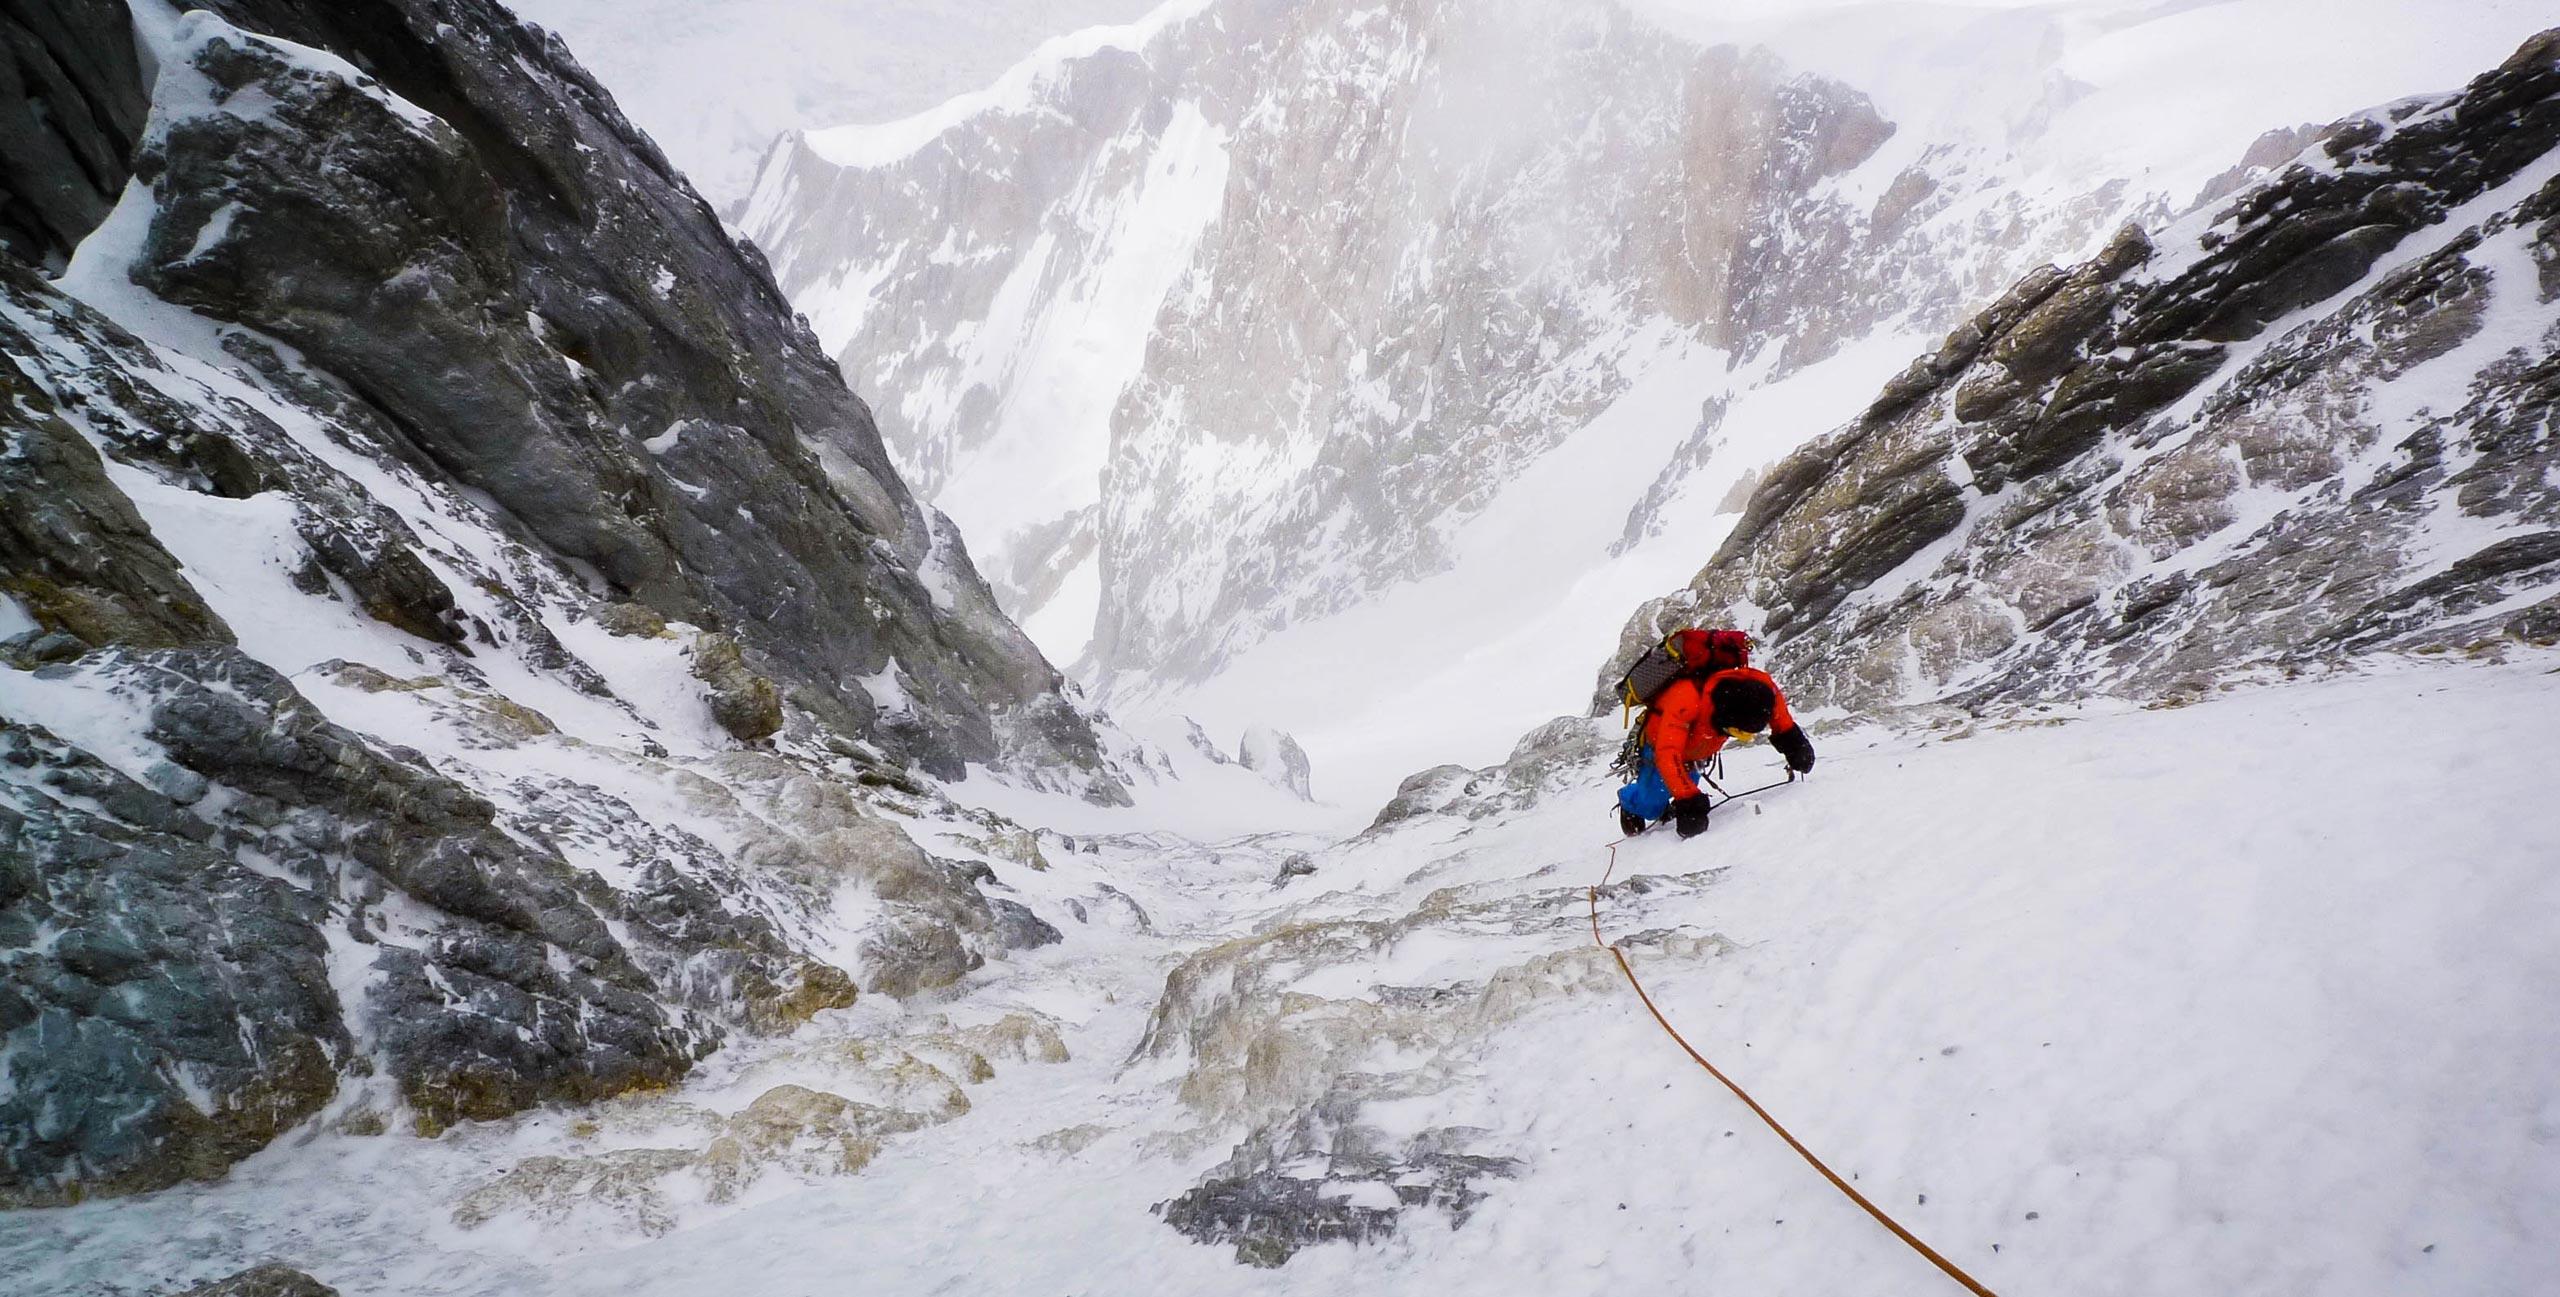 4babeeeead Alpine style at its best  Czechs Marek Holeček and Zdeněk Hák stunned the  climbing community by opening